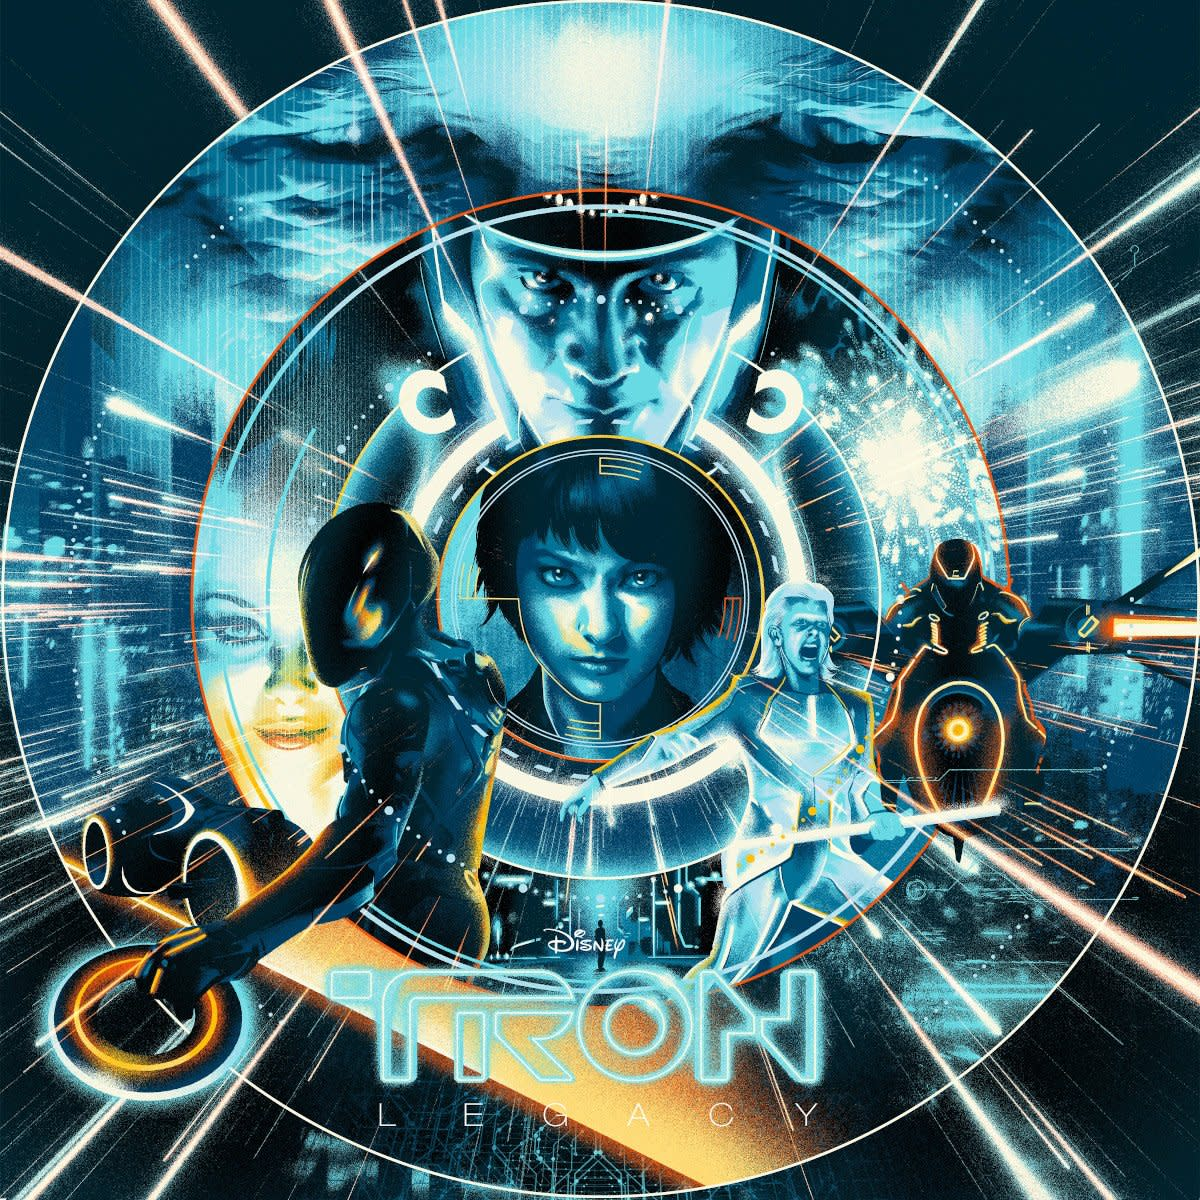 Daft Pink Tron Legacy Soundtrack Vinyl Reissue Mondo